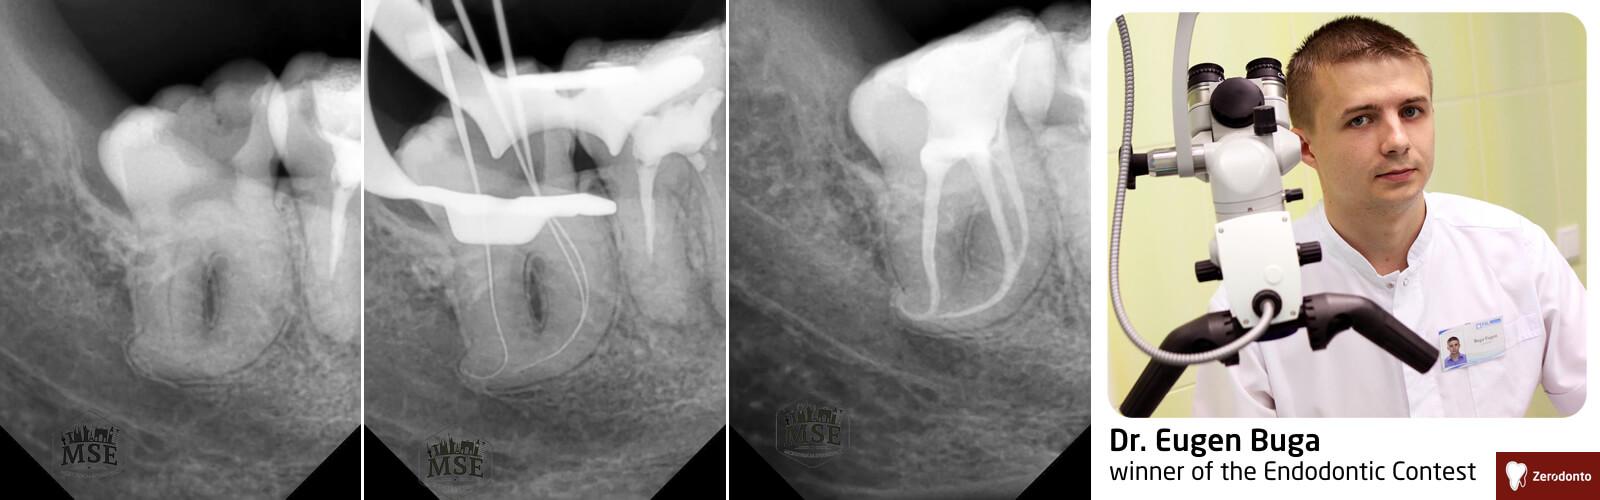 Endodontic Contest – contest #1